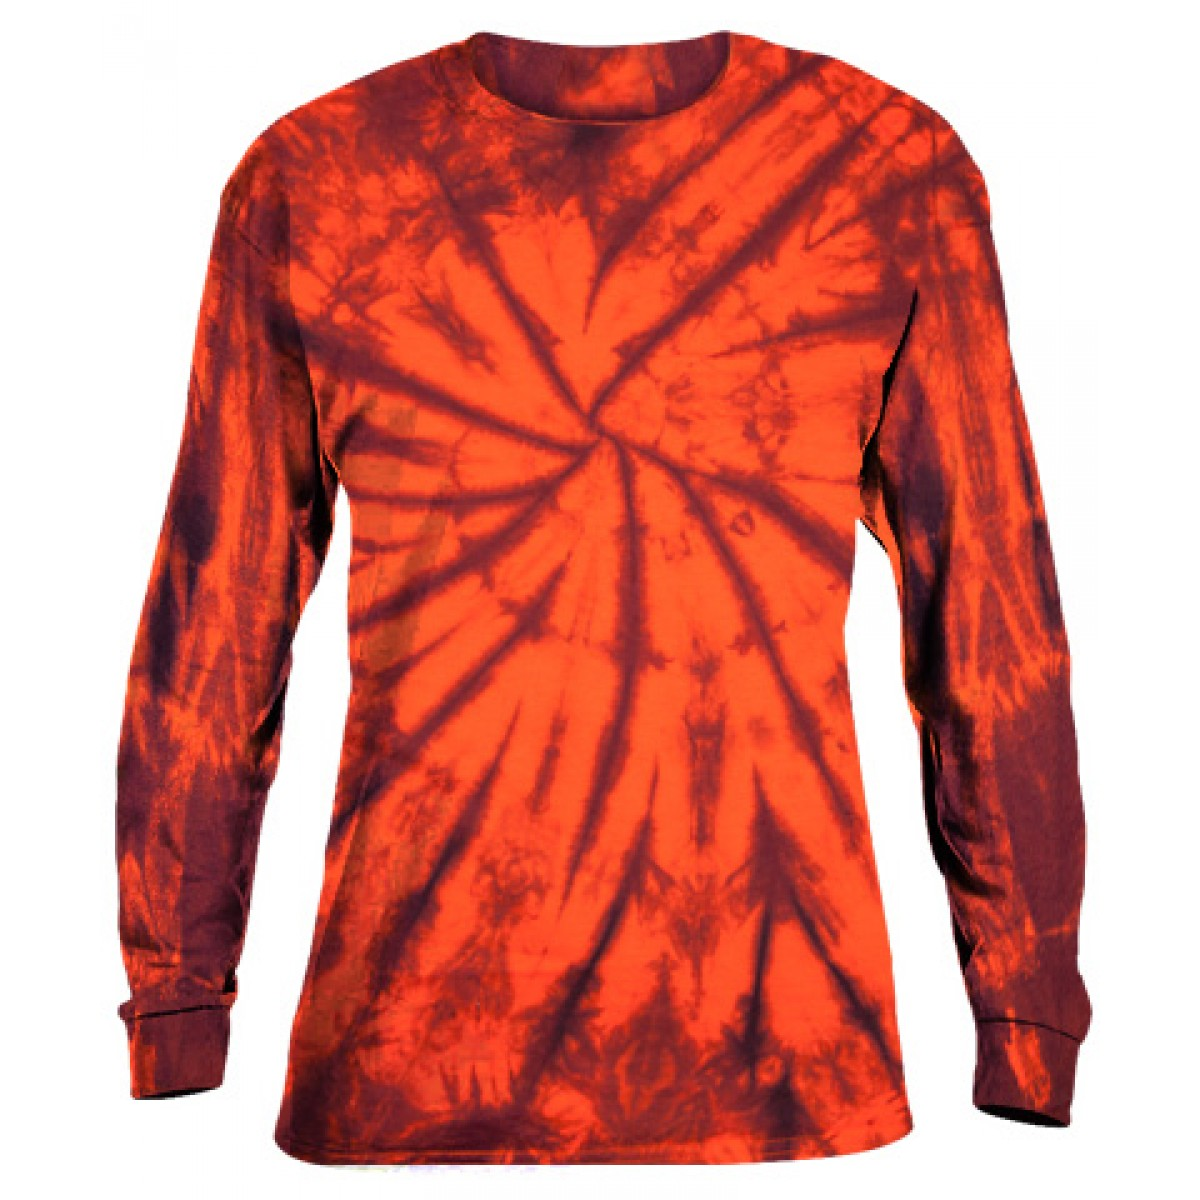 Tie-Dye Long Sleeve Shirt -Fall Orange -L